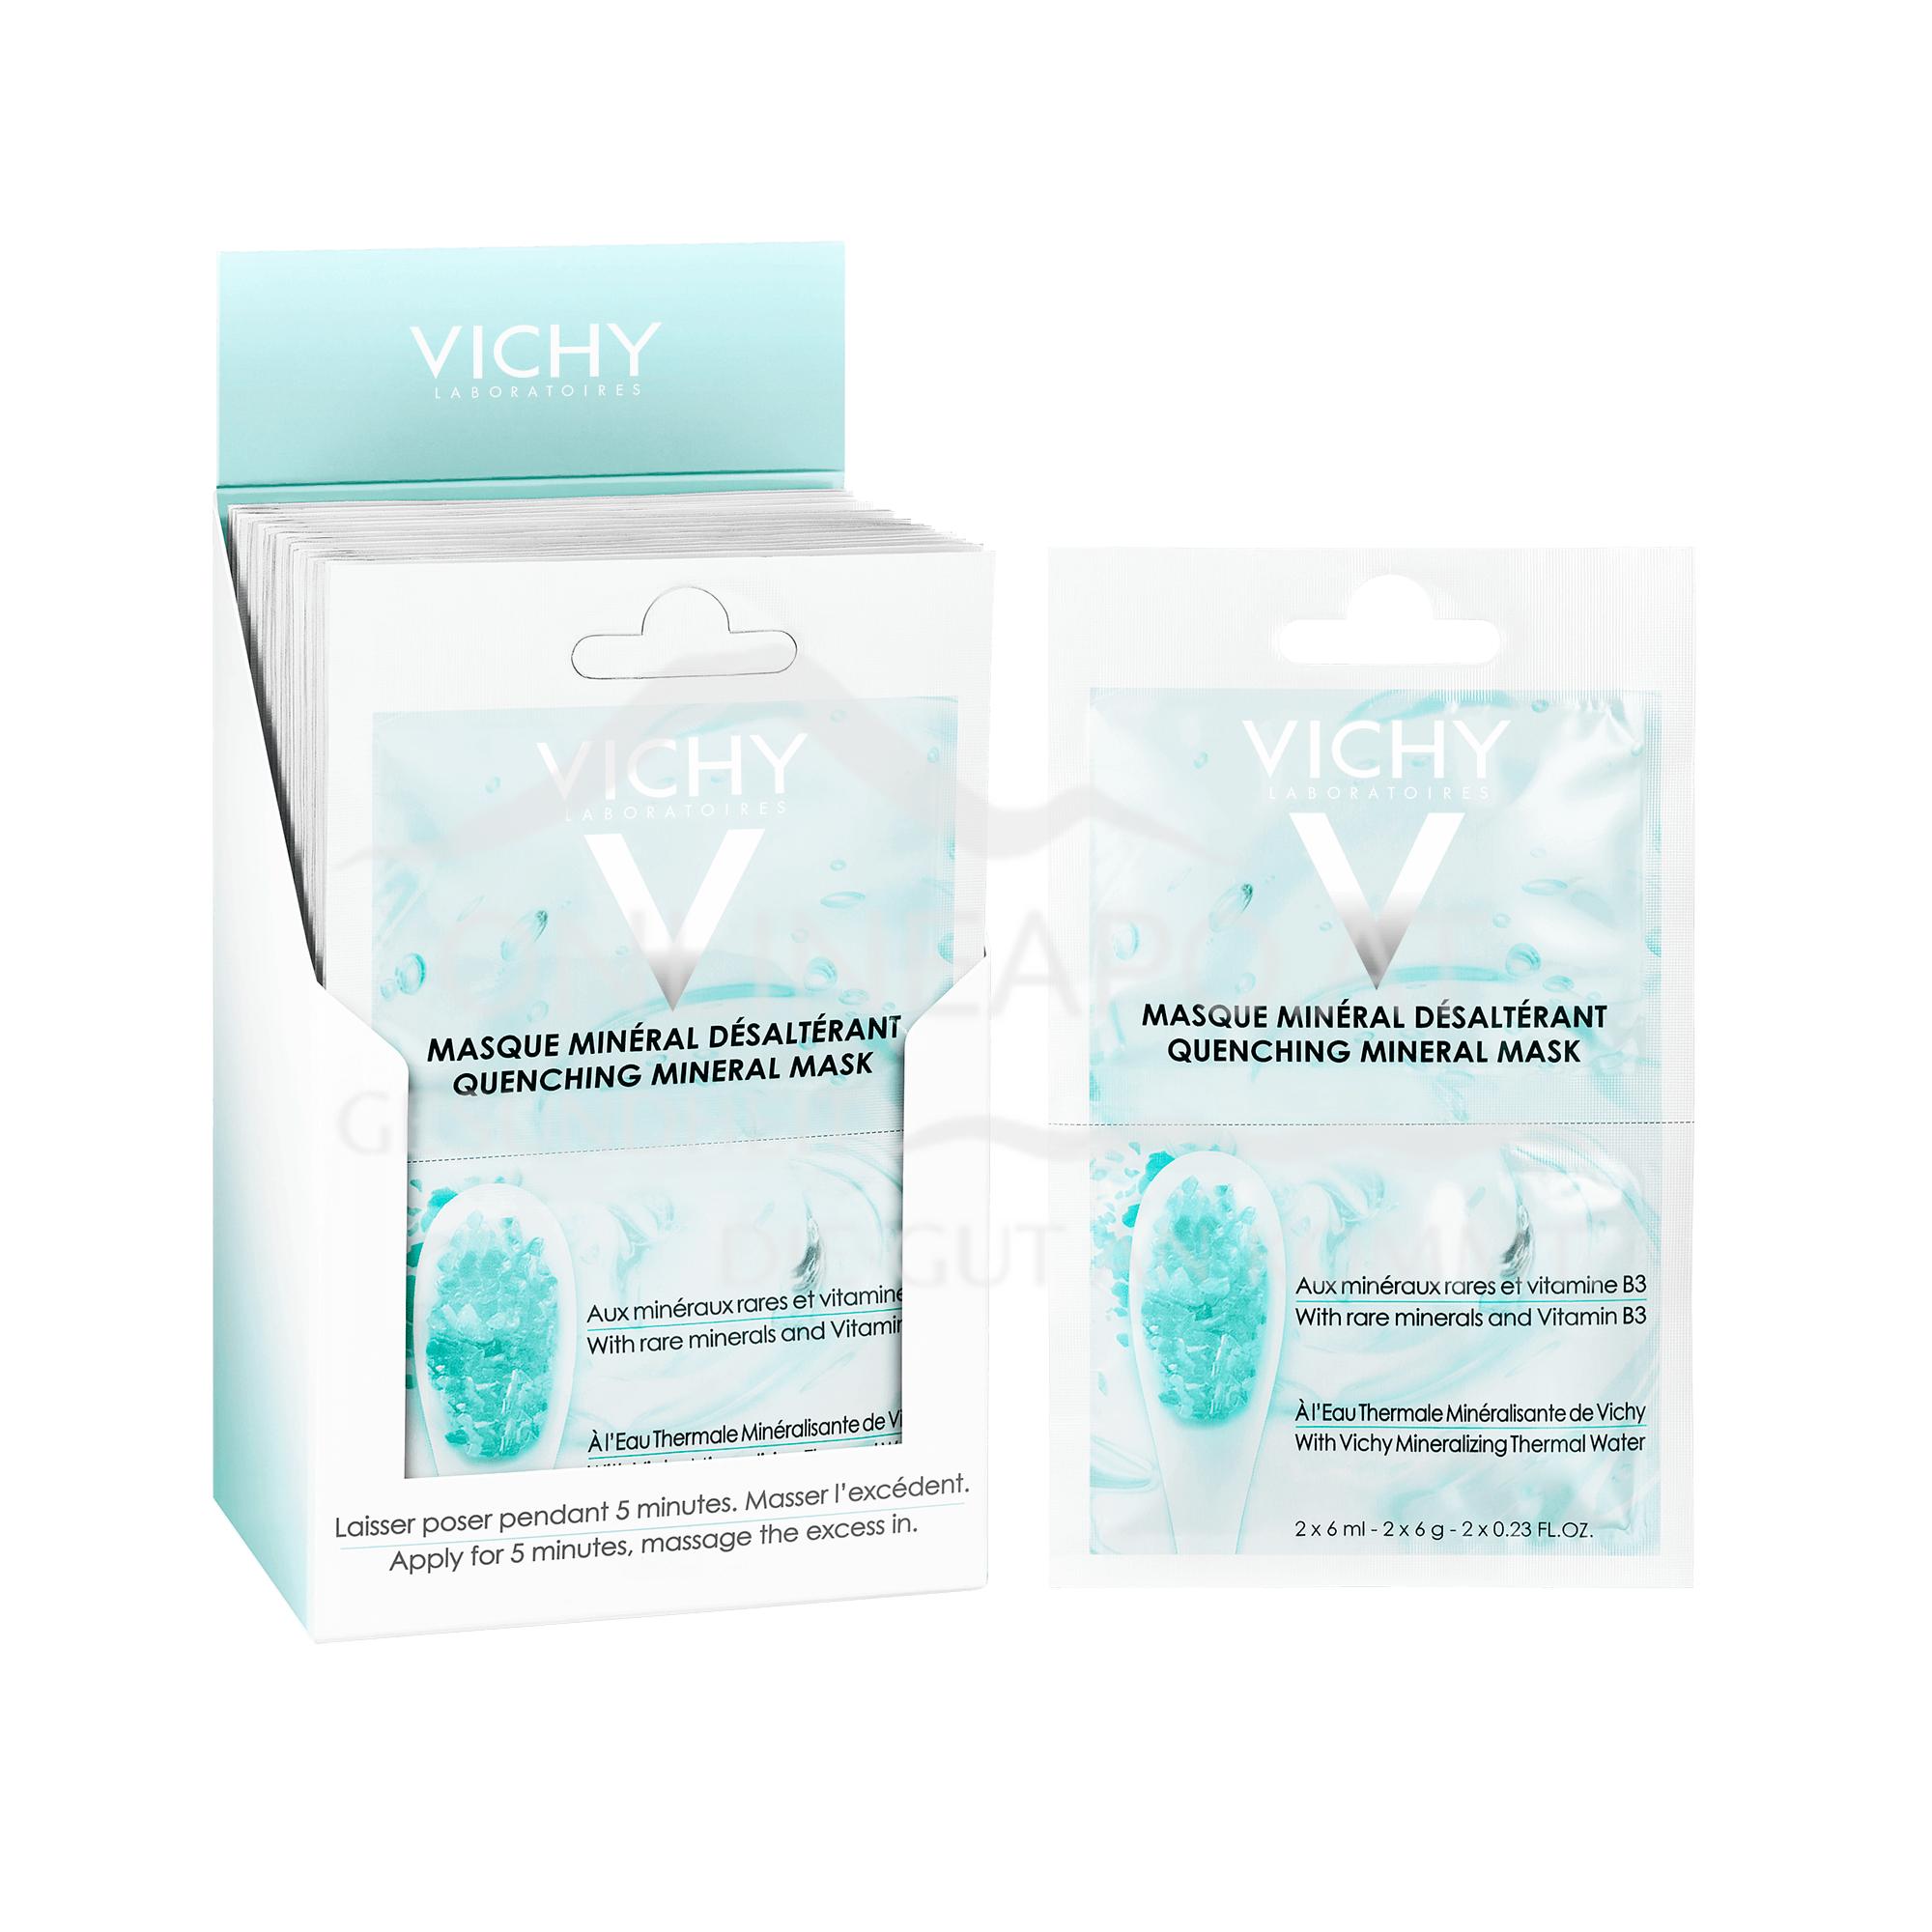 VICHY Pureté Thermale Feuchtigkeitspendende Maske Duo-Sachet 2x6ml